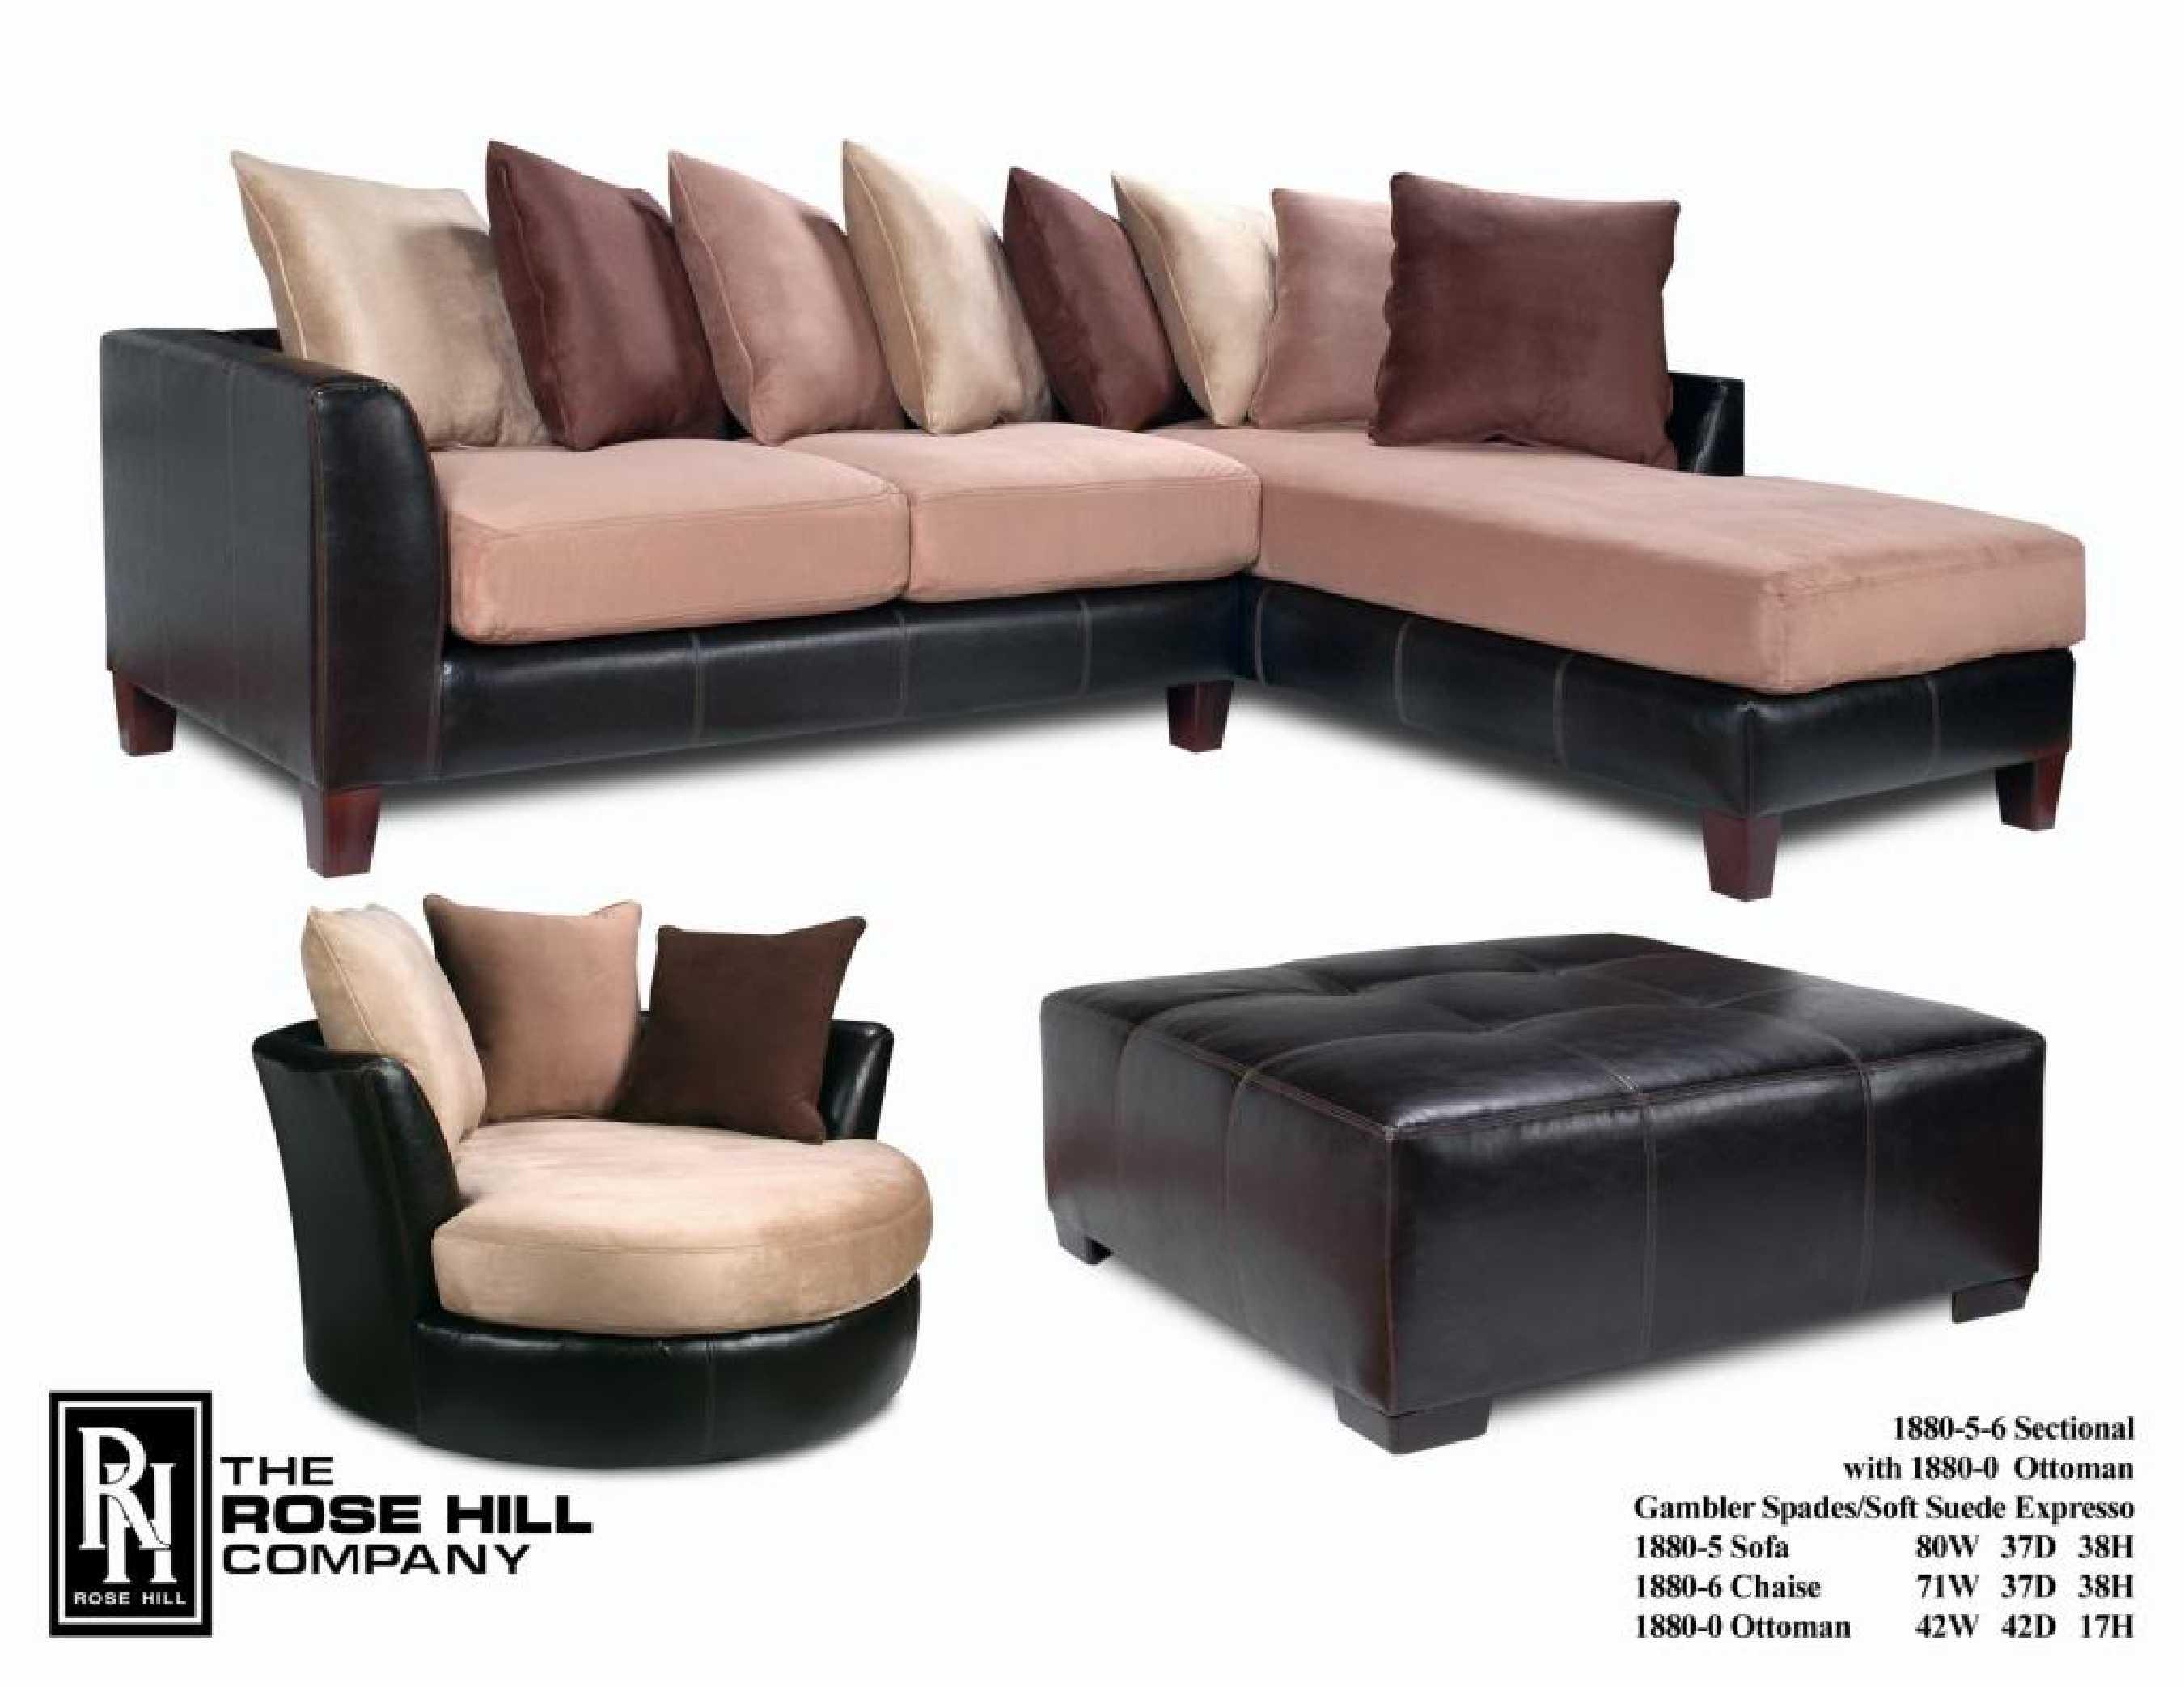 Collection Walmart Sectional Sofa – Buildsimplehome Throughout Sectional Sofas At Walmart (Image 2 of 10)